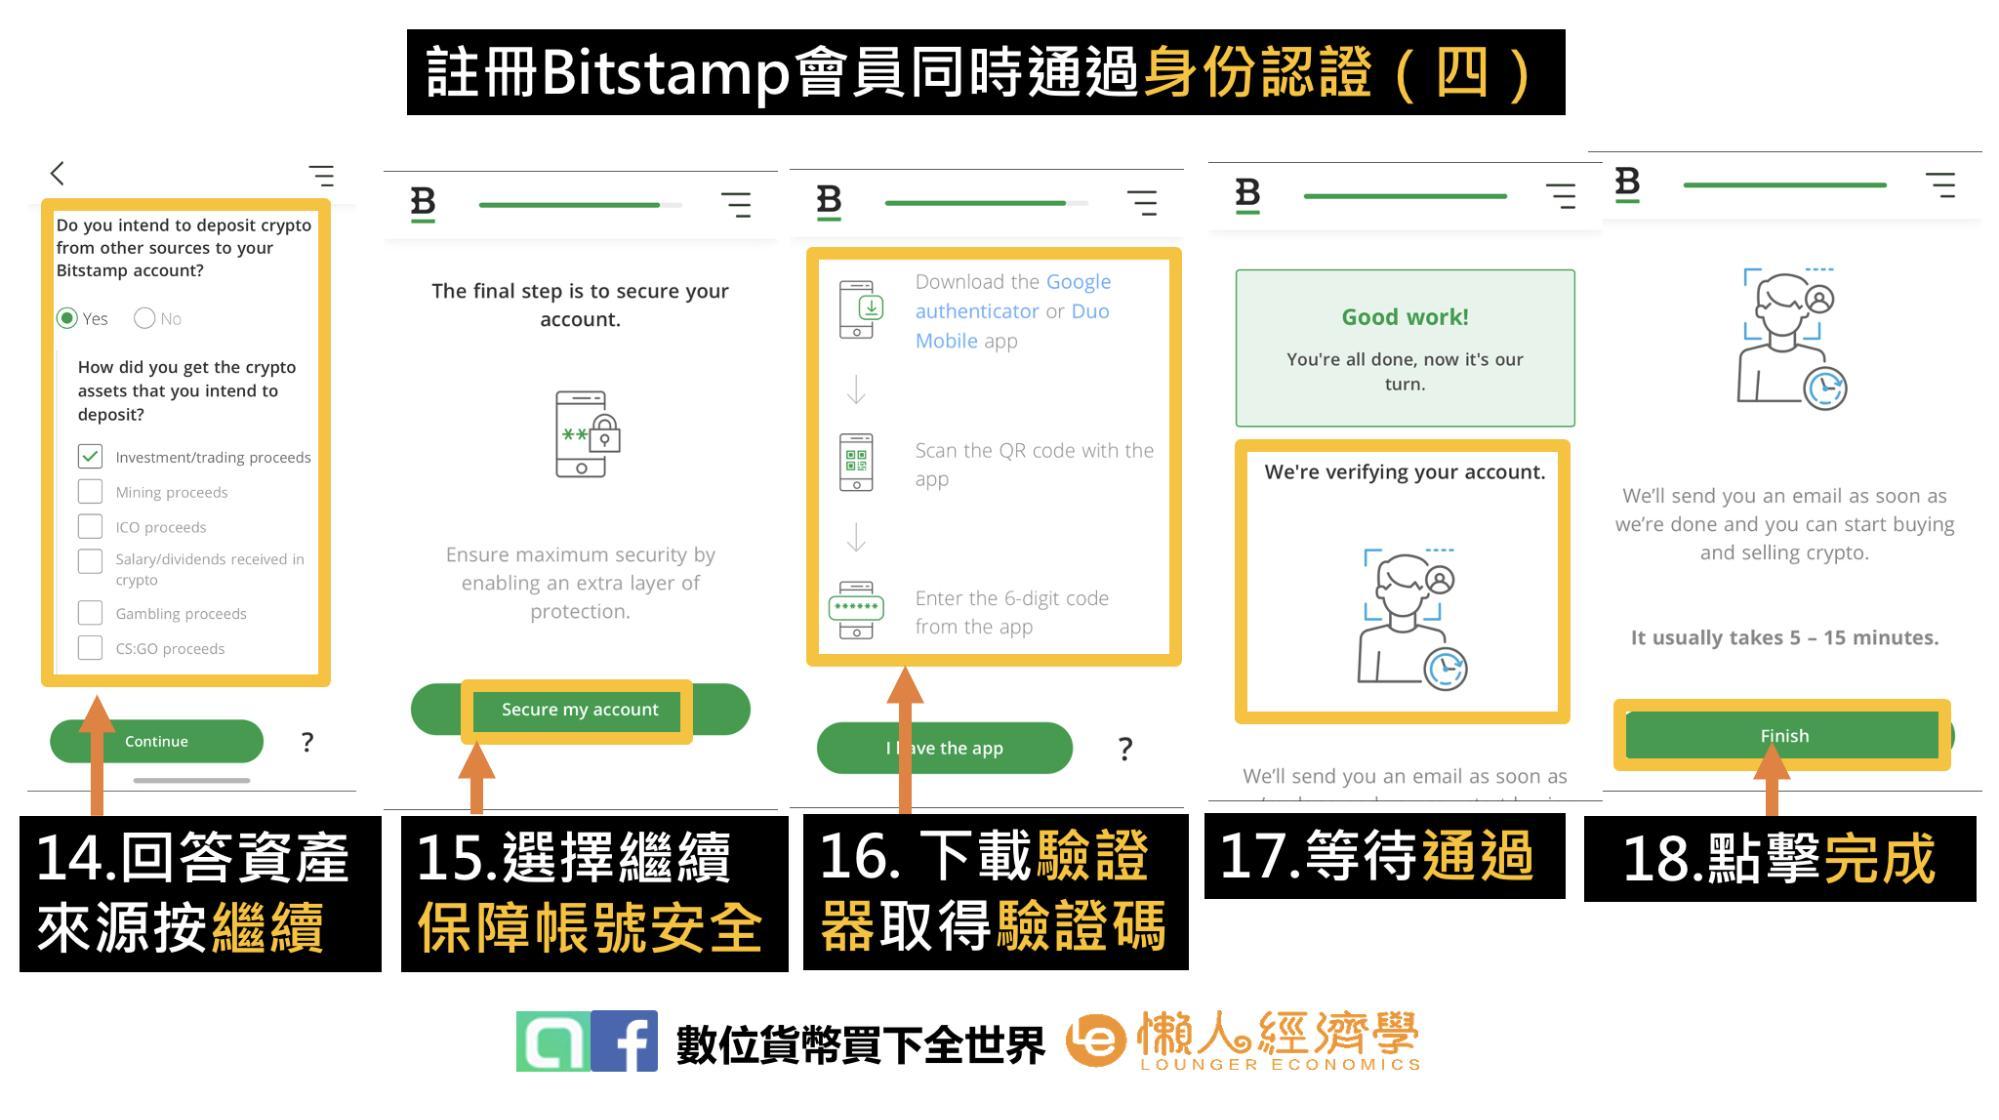 Bitstamp交易所註冊同時進行身份認證流程(四)